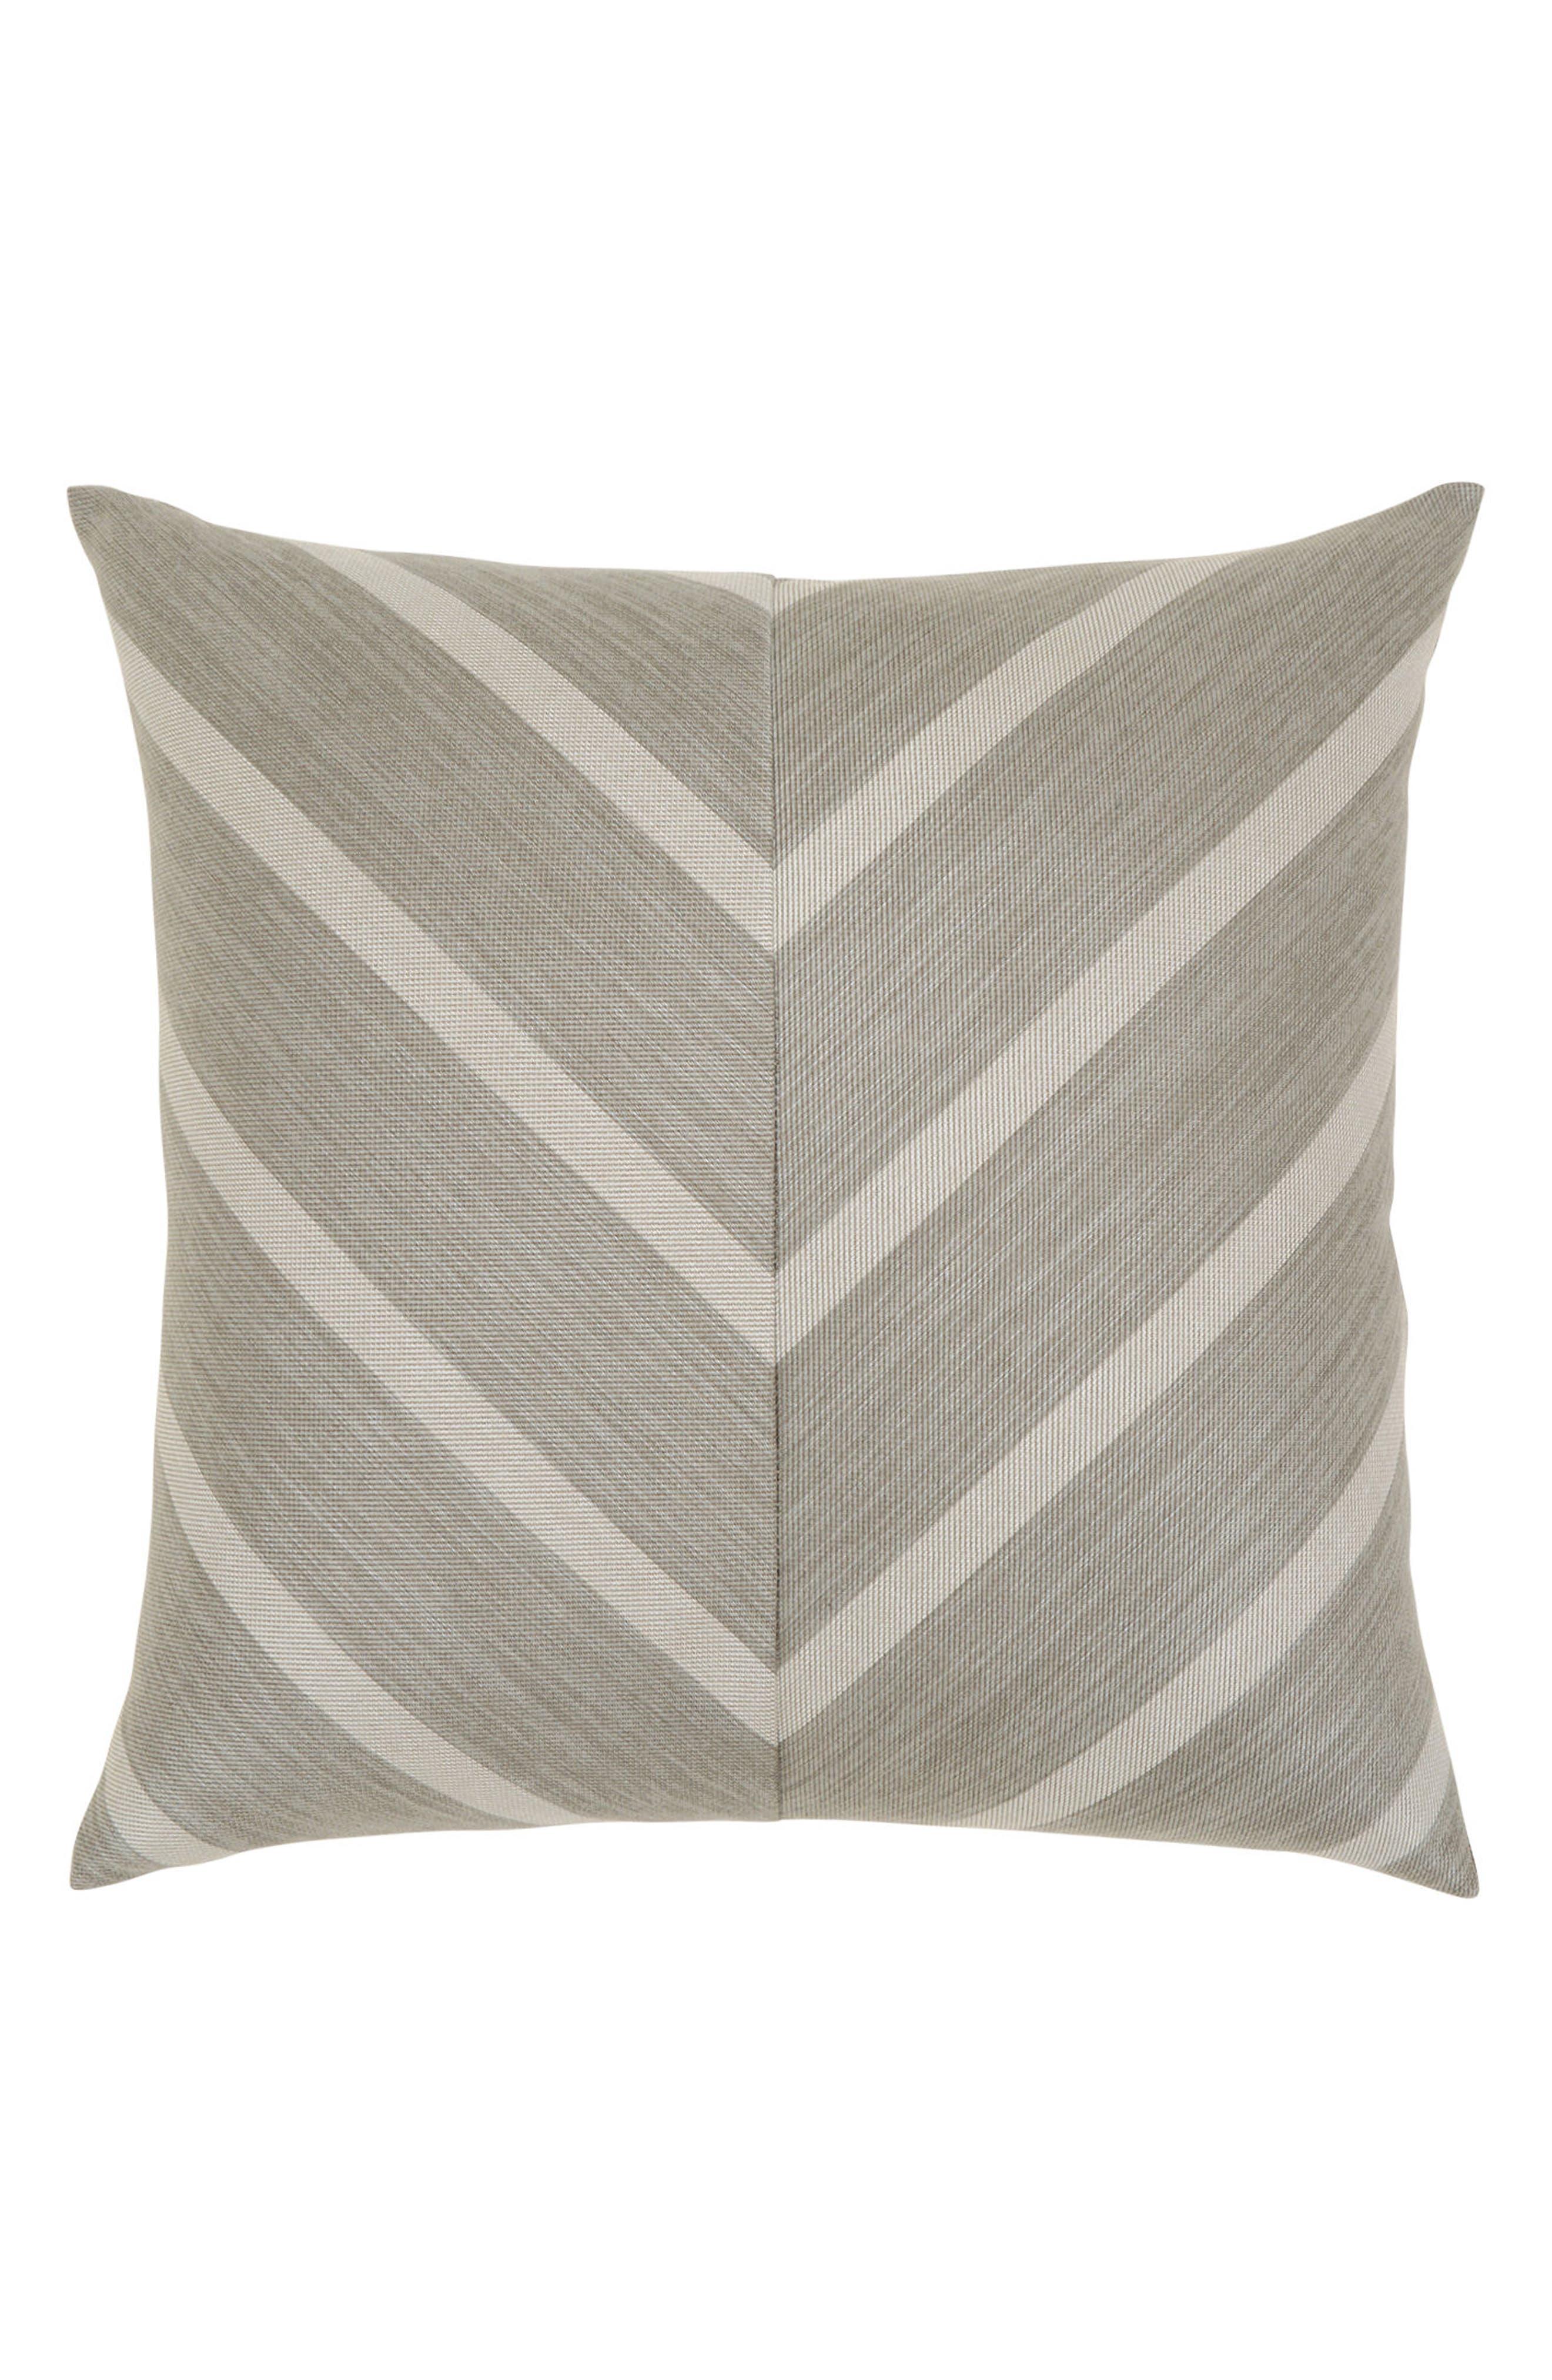 Elaine Smith Sparkle Chevron Indoor/Outdoor Accent Pillow